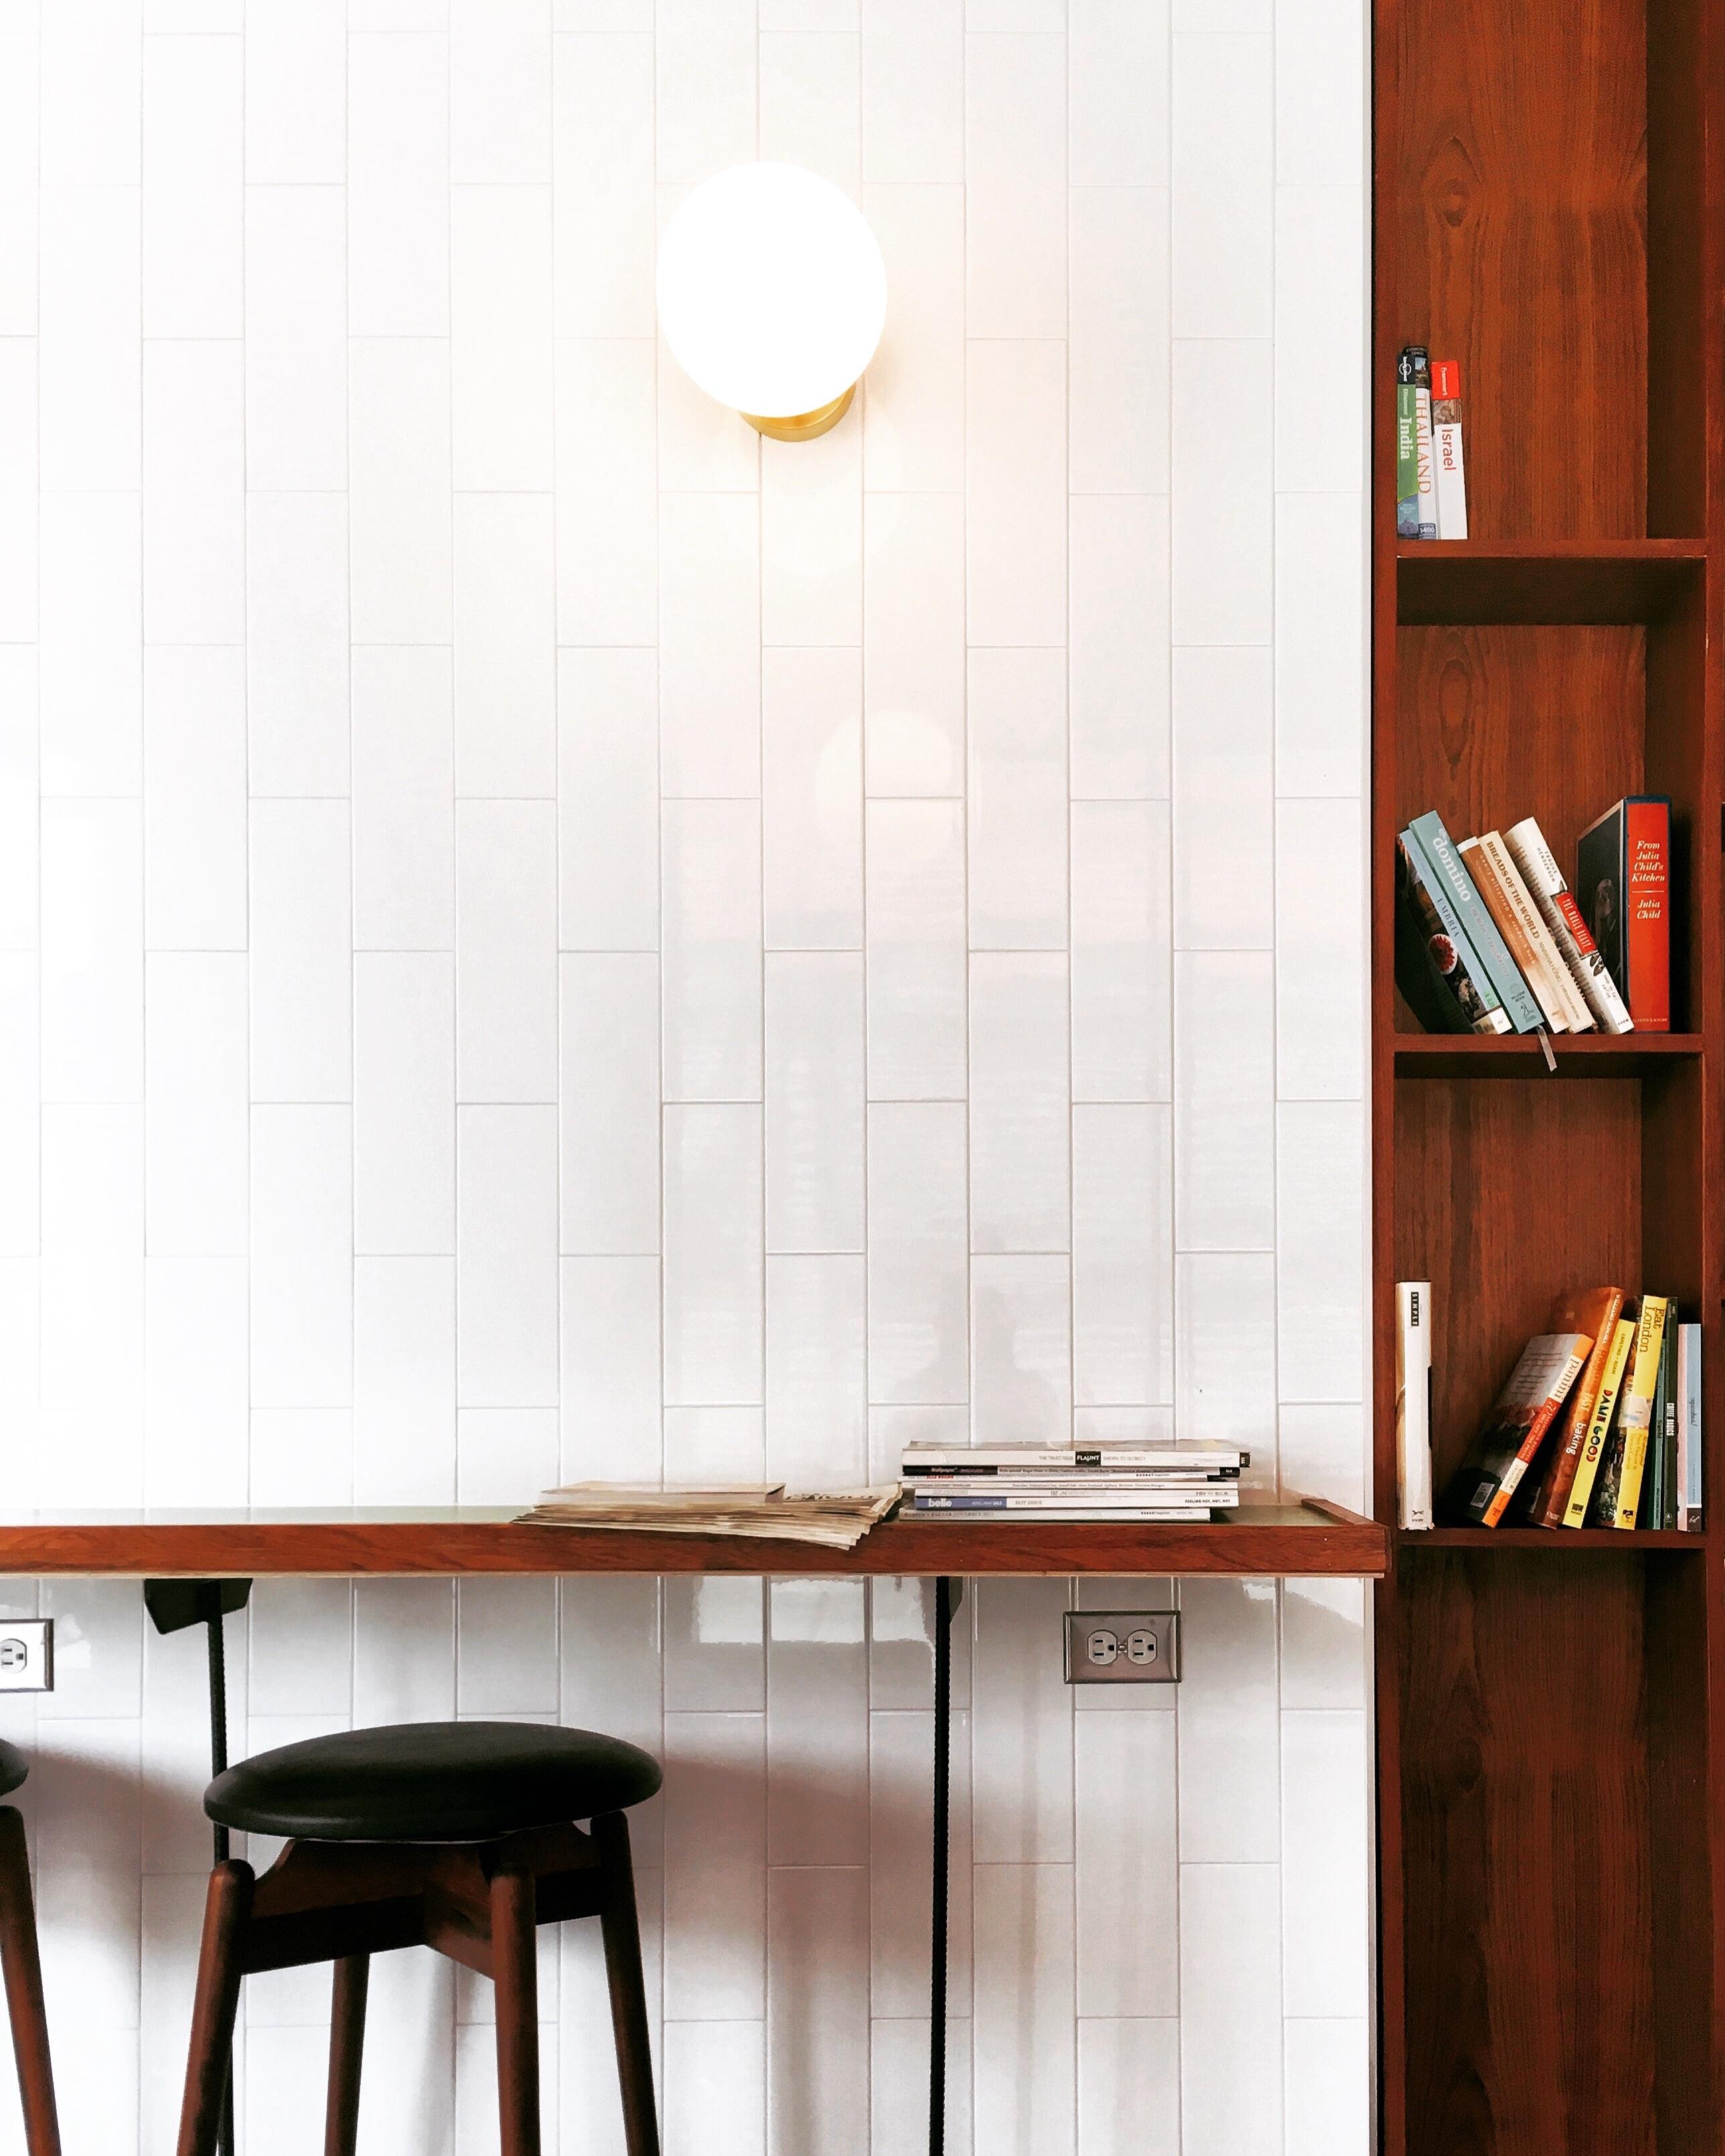 Fotos gratis : piso, techo, cocina, mueble, habitación, iluminación ...